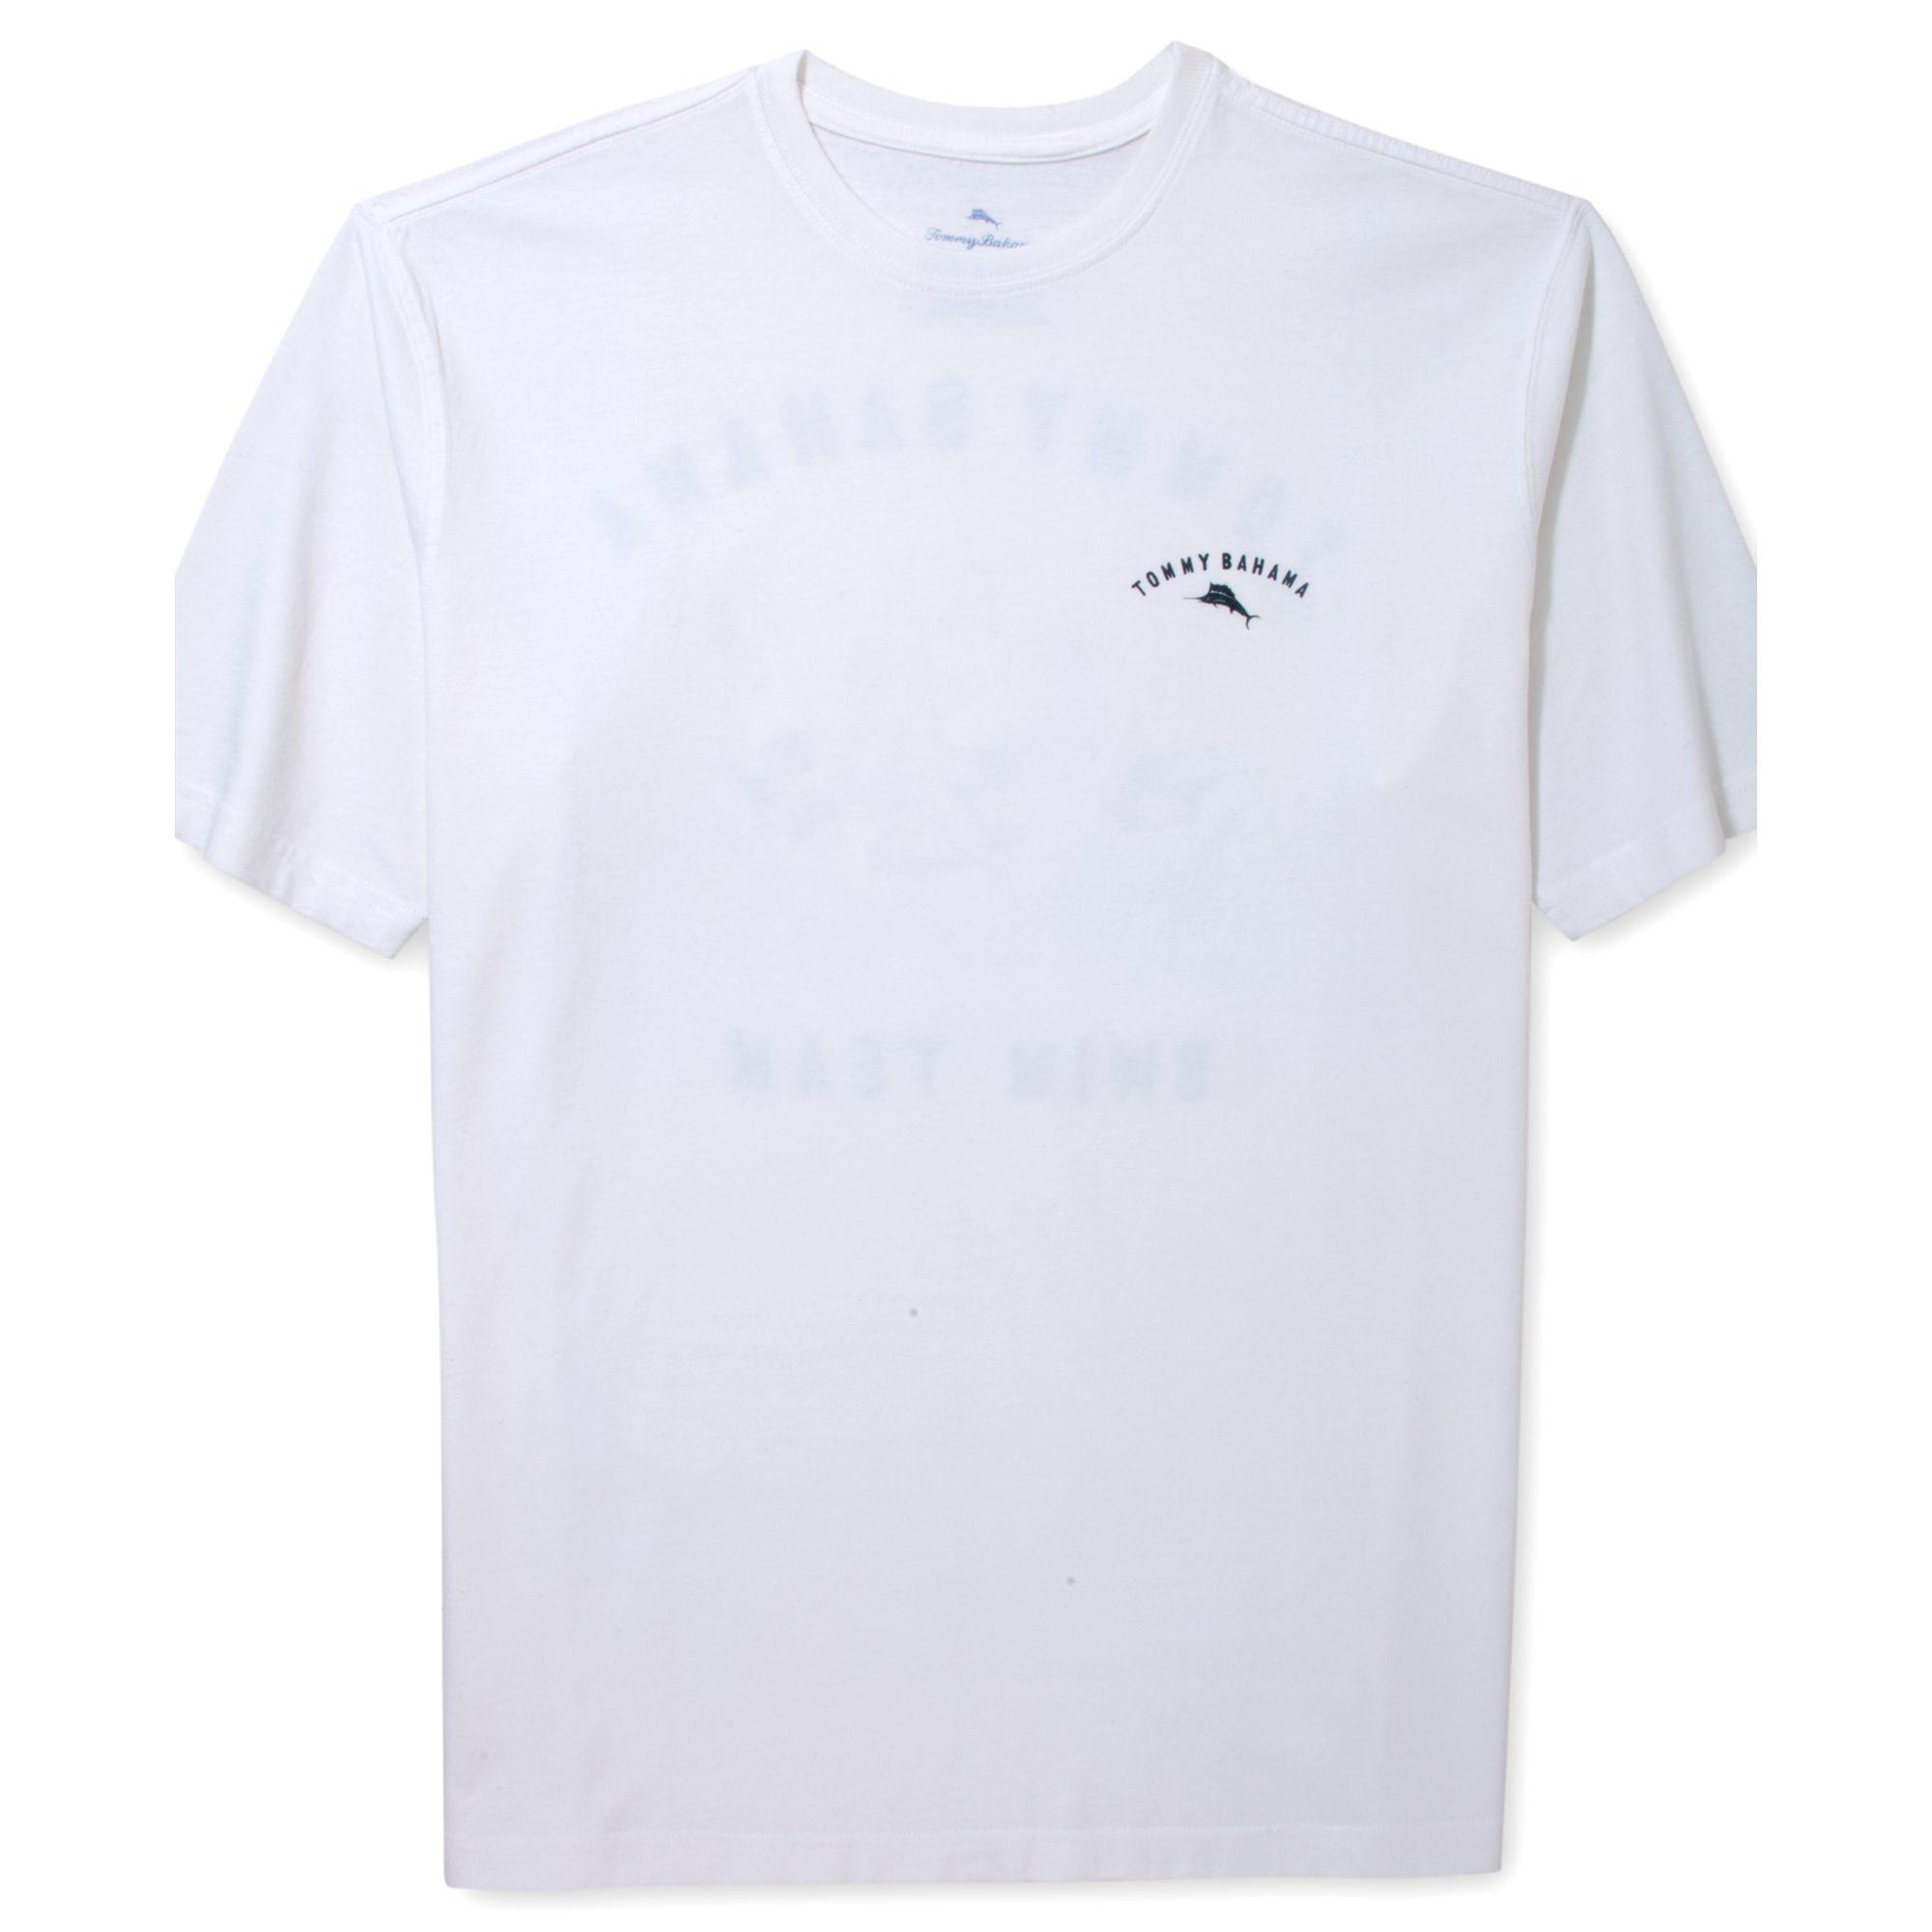 Tommy Bahama Swim Team Tshirt In White For Men Lyst